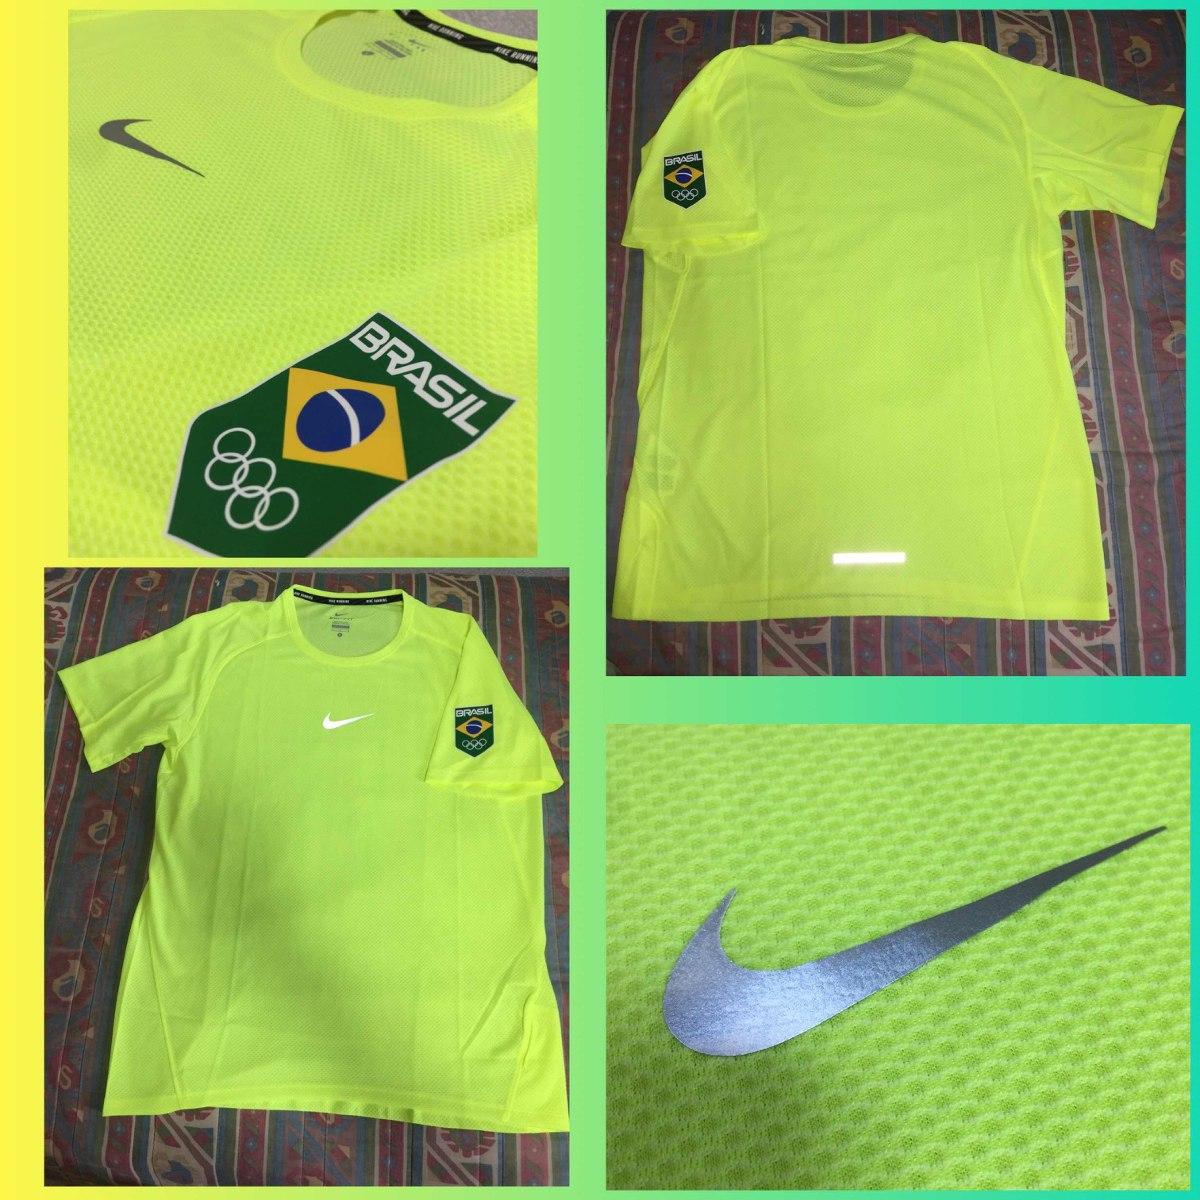 bf84415a91270 camiseta nike brasil olimpíadas amarela rio2016. Carregando zoom.